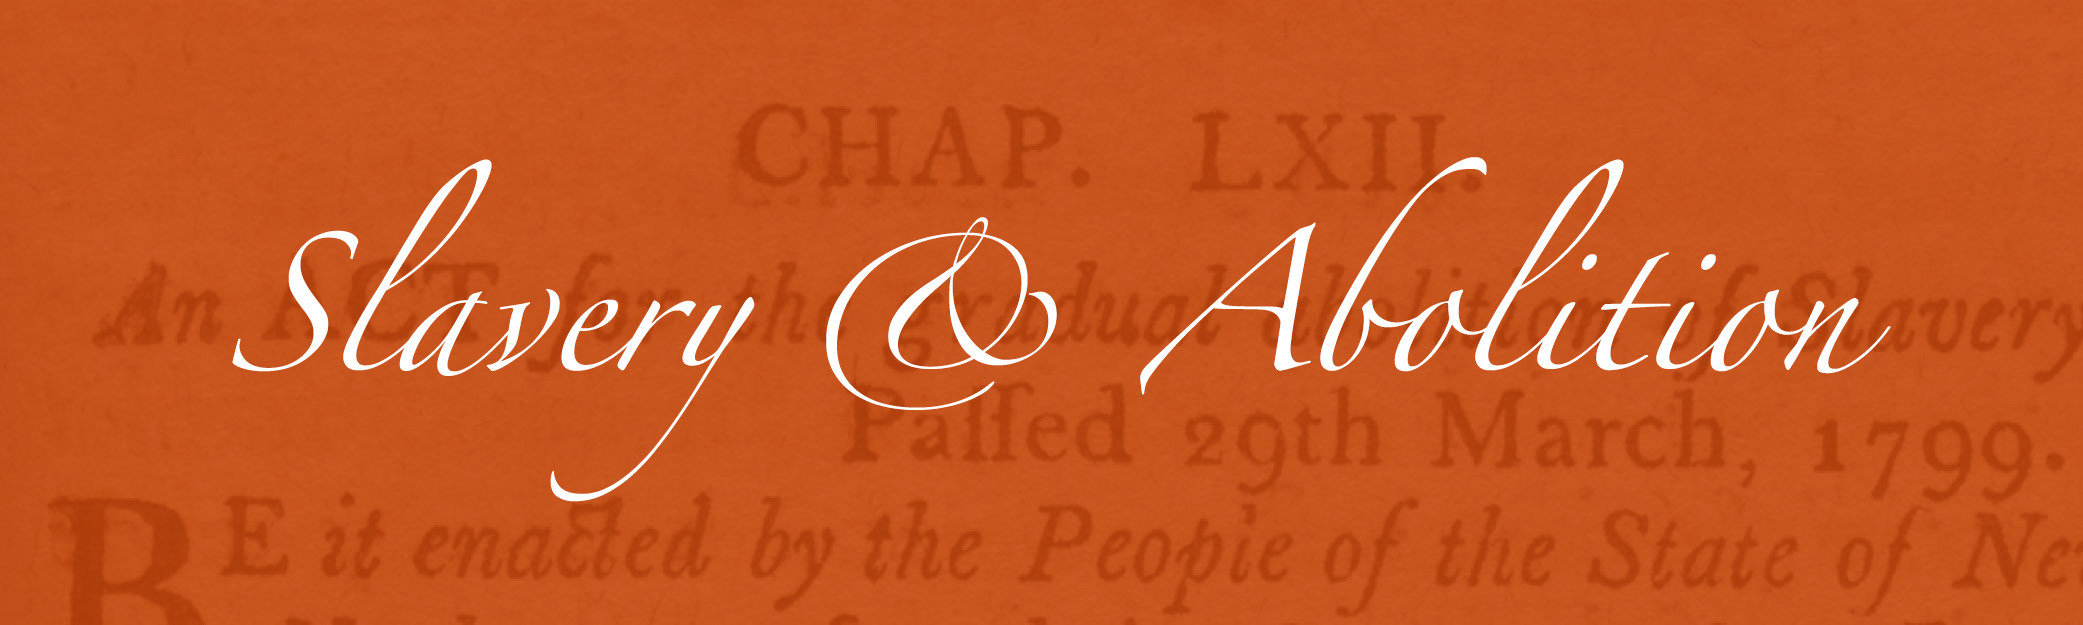 Slavery & Abolition Banner